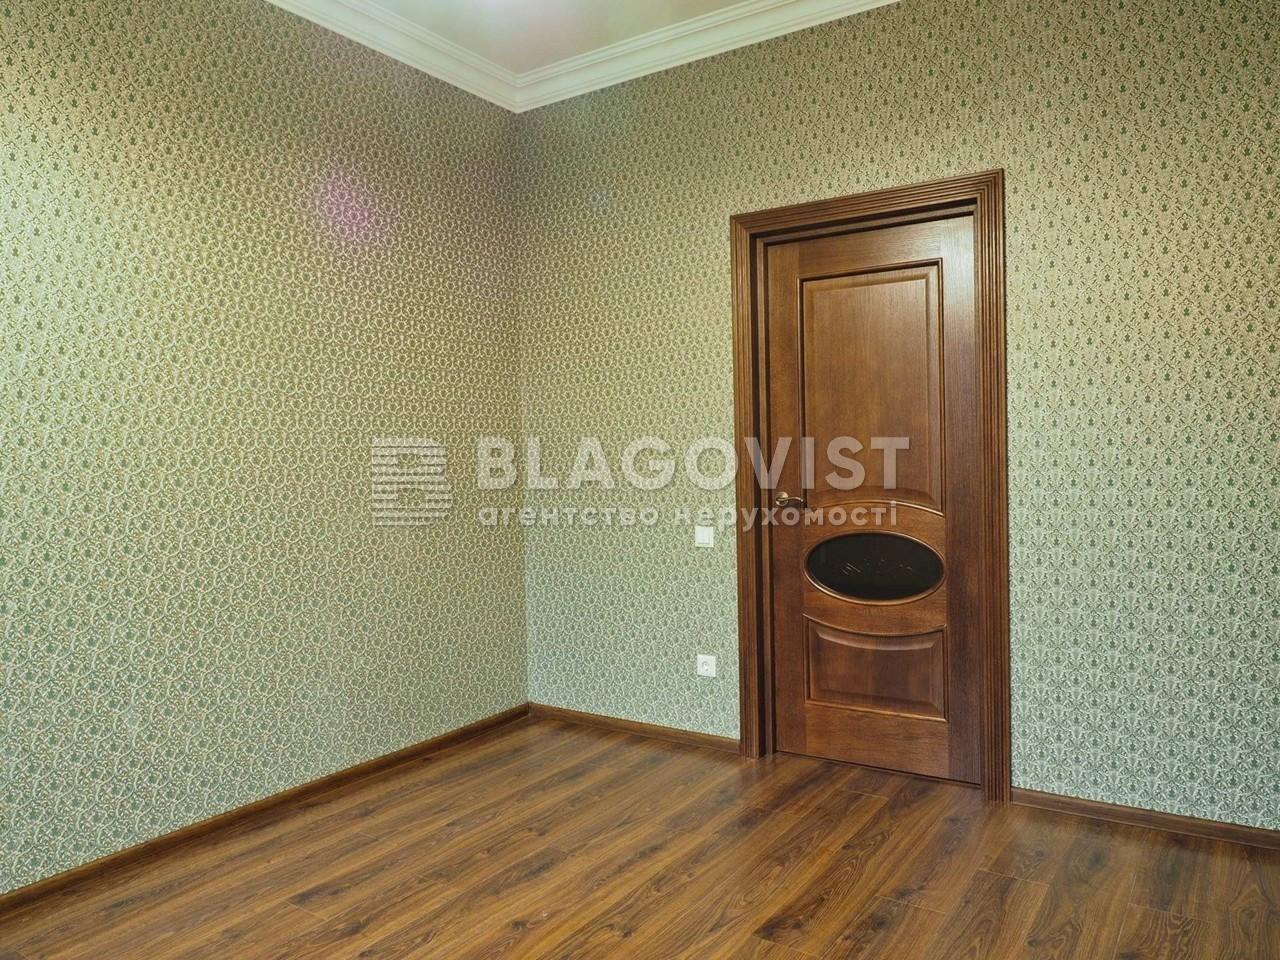 Квартира M-38484, Искровская, 3, Киев - Фото 9